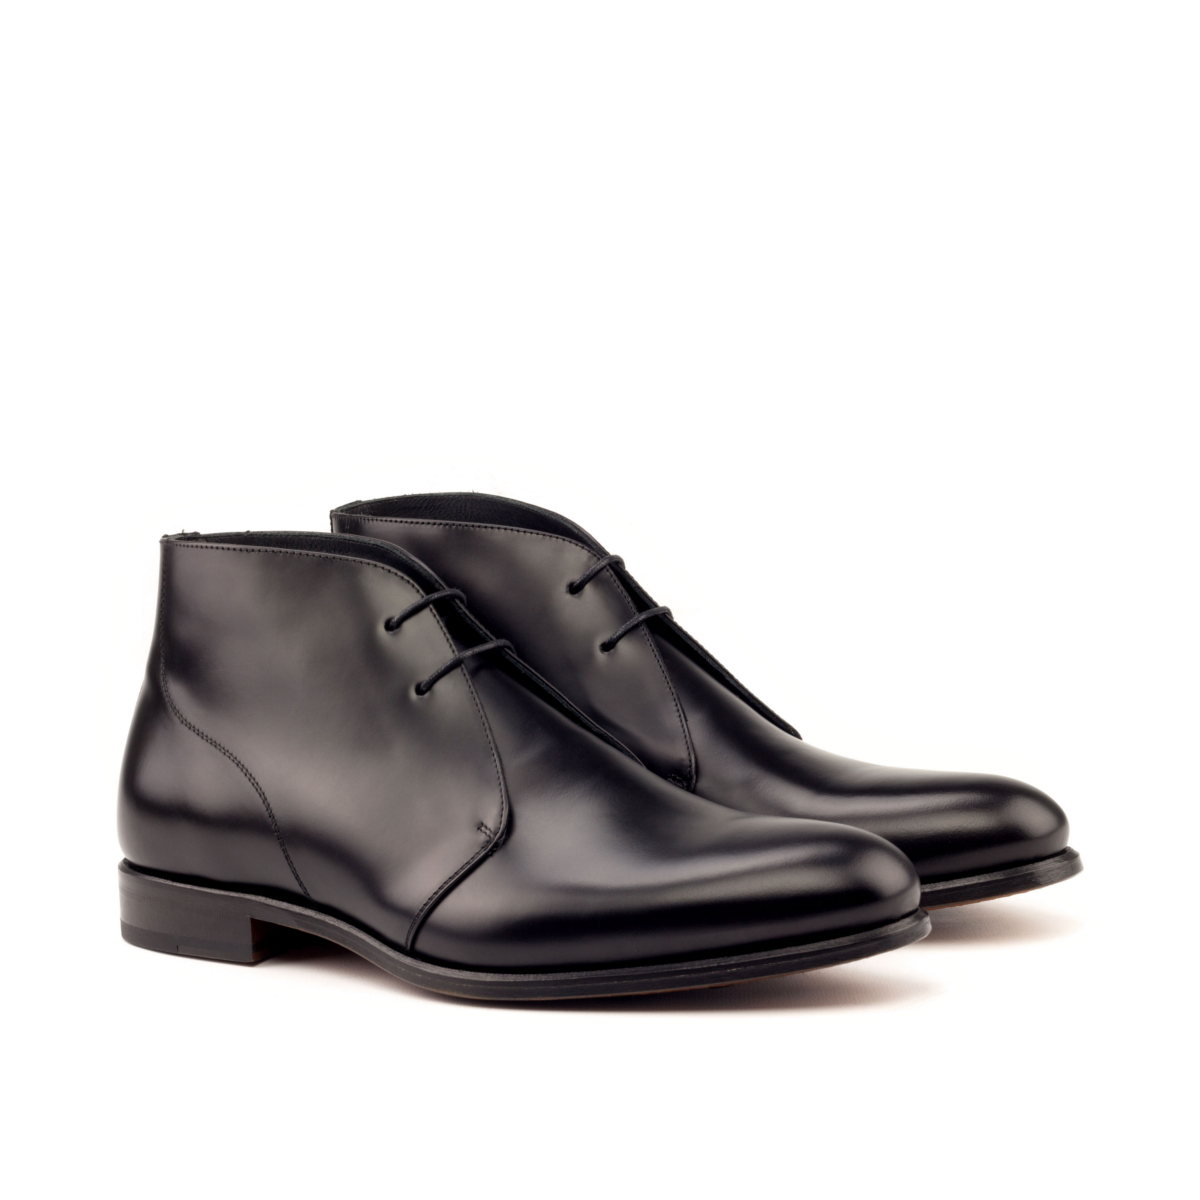 Black box calf Chukka boot